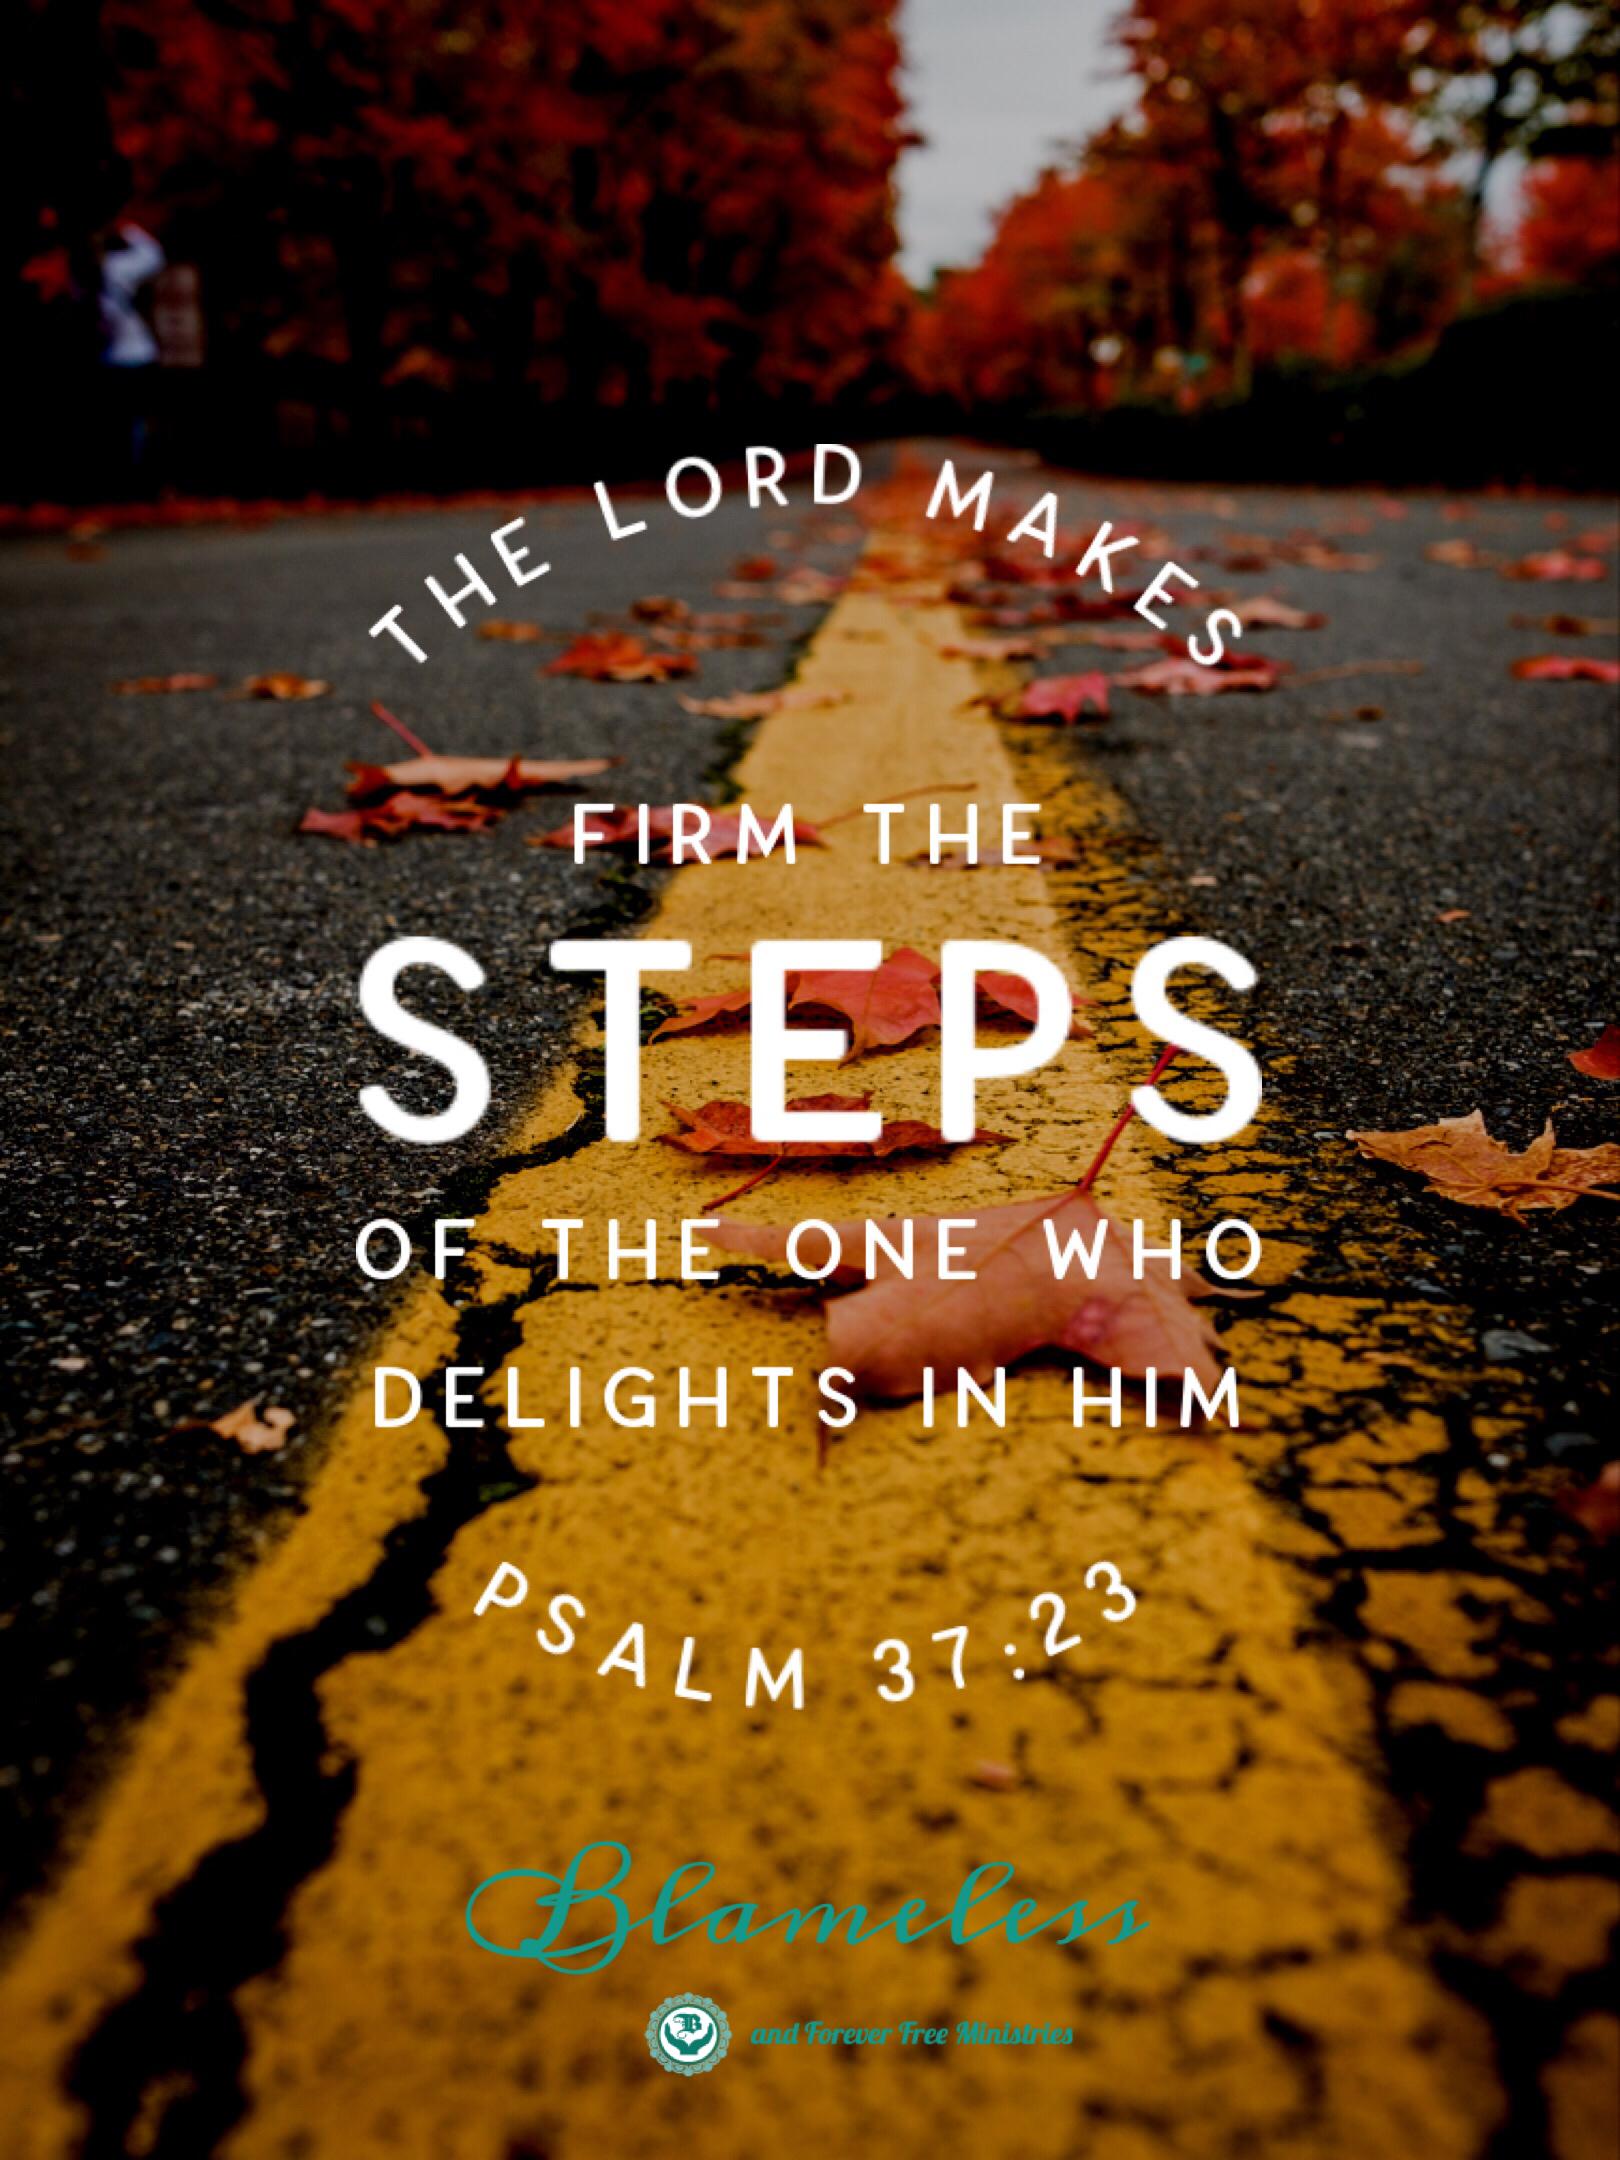 Blameless Psalm 37.23